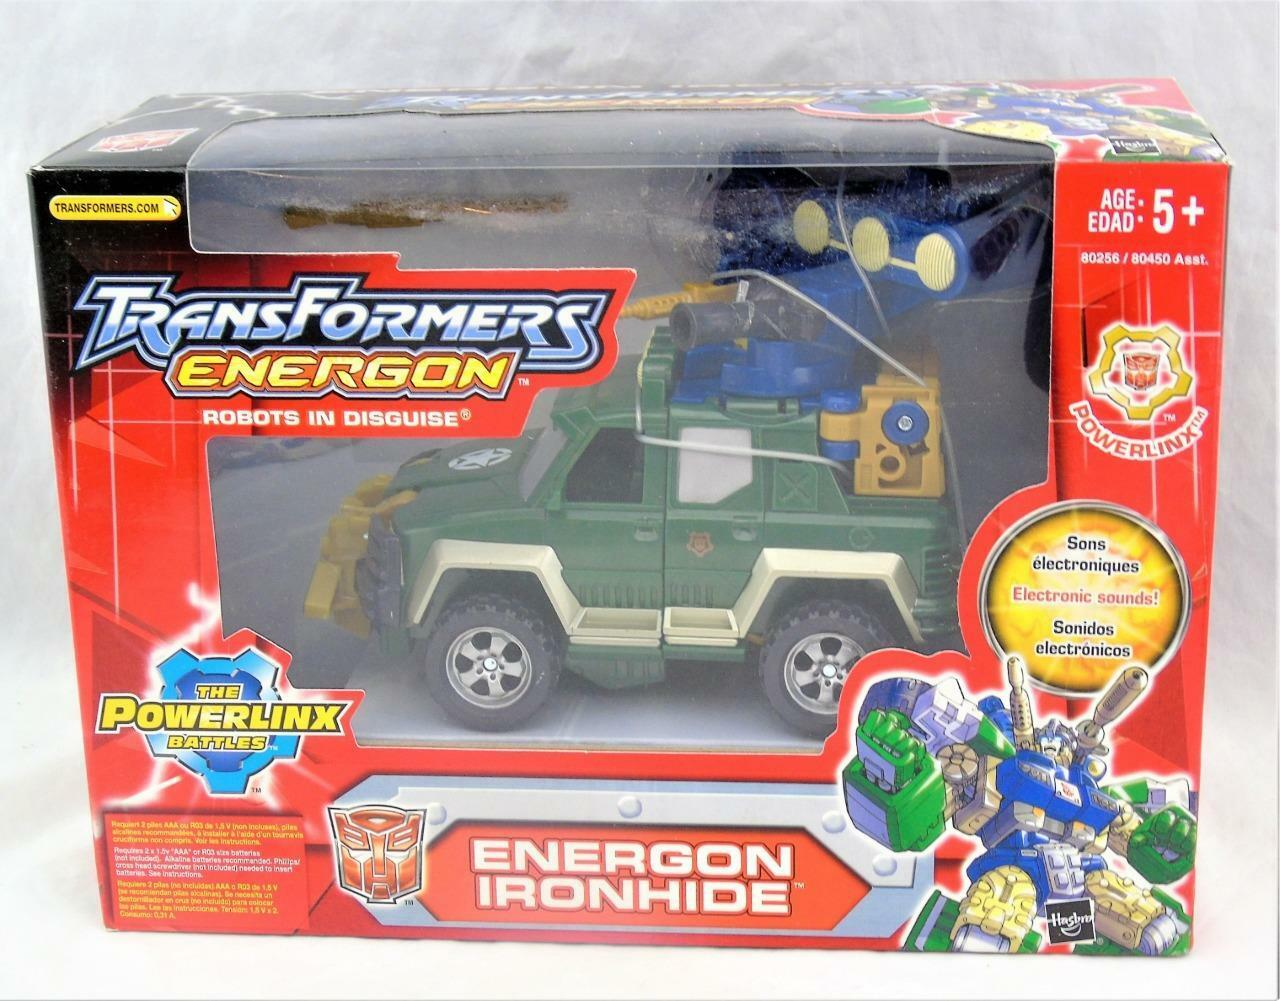 Transformers Energon 2004  RID Power Linx Vert Ironhide Hommesthe en Boîte Scellée  dans les promotions de stade